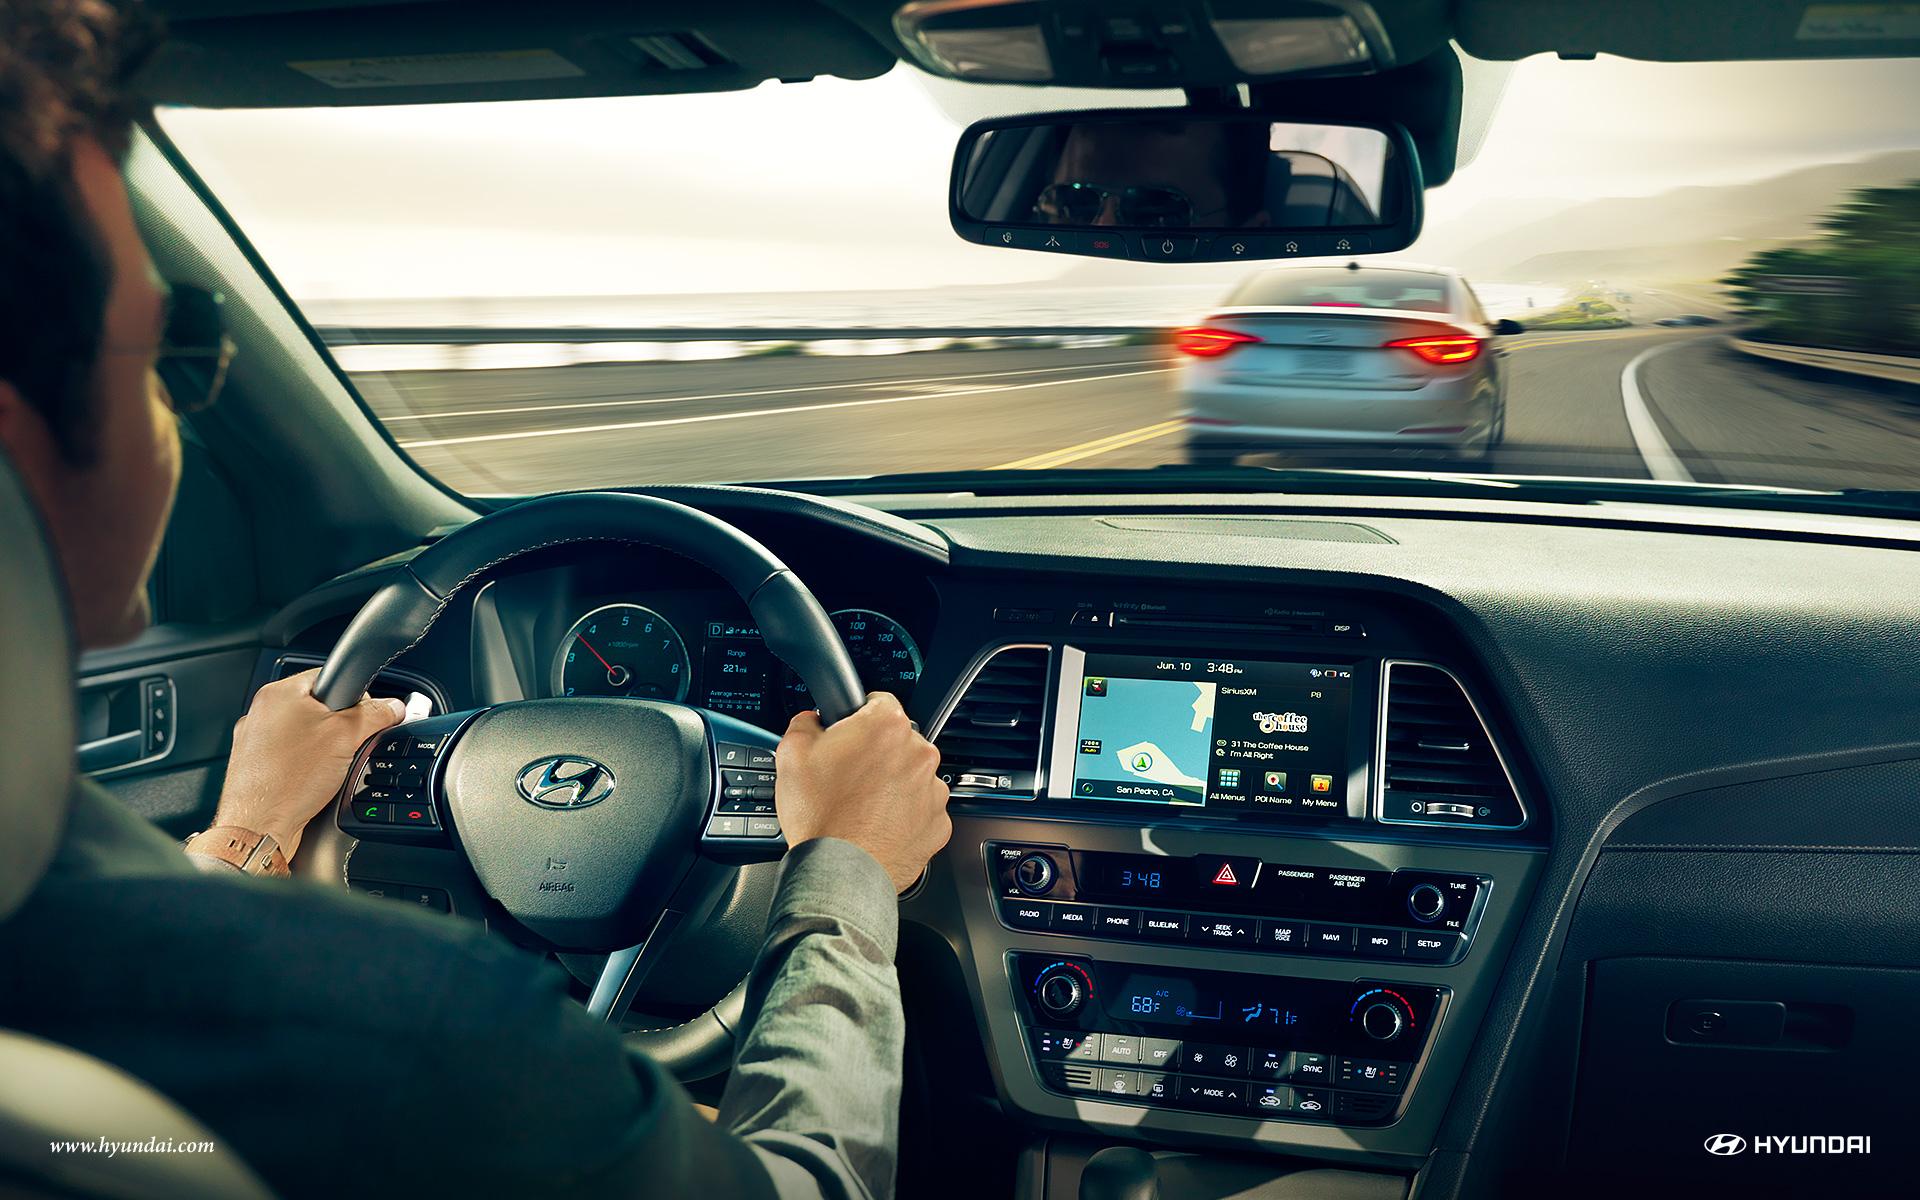 2017 Hyundai Sonata Interior 3